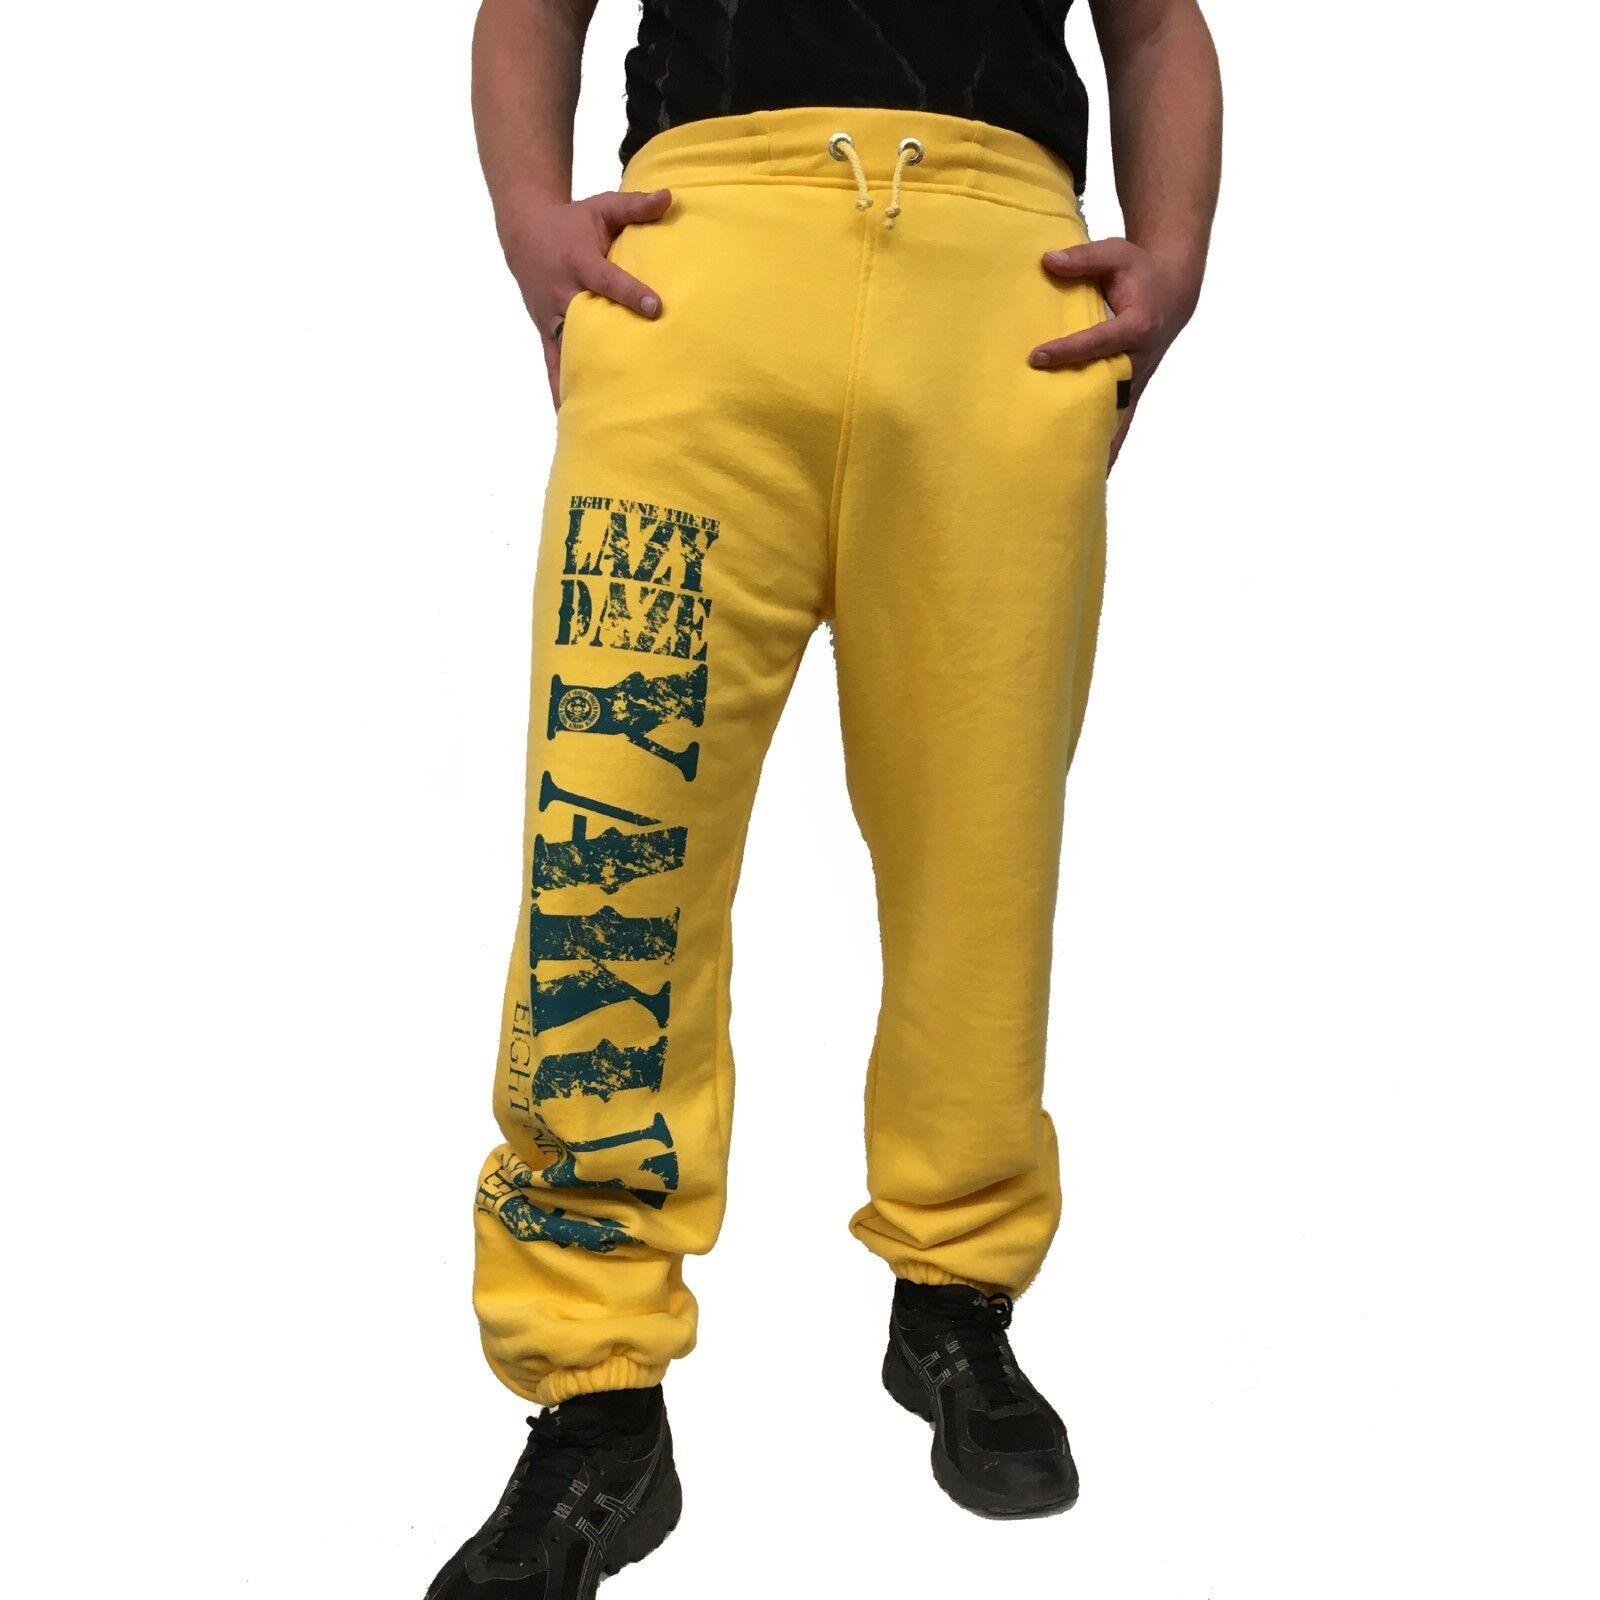 YAKUZA - Herren Jogginghose JOB 7034  Lazy Daze  banana cream (gelb)